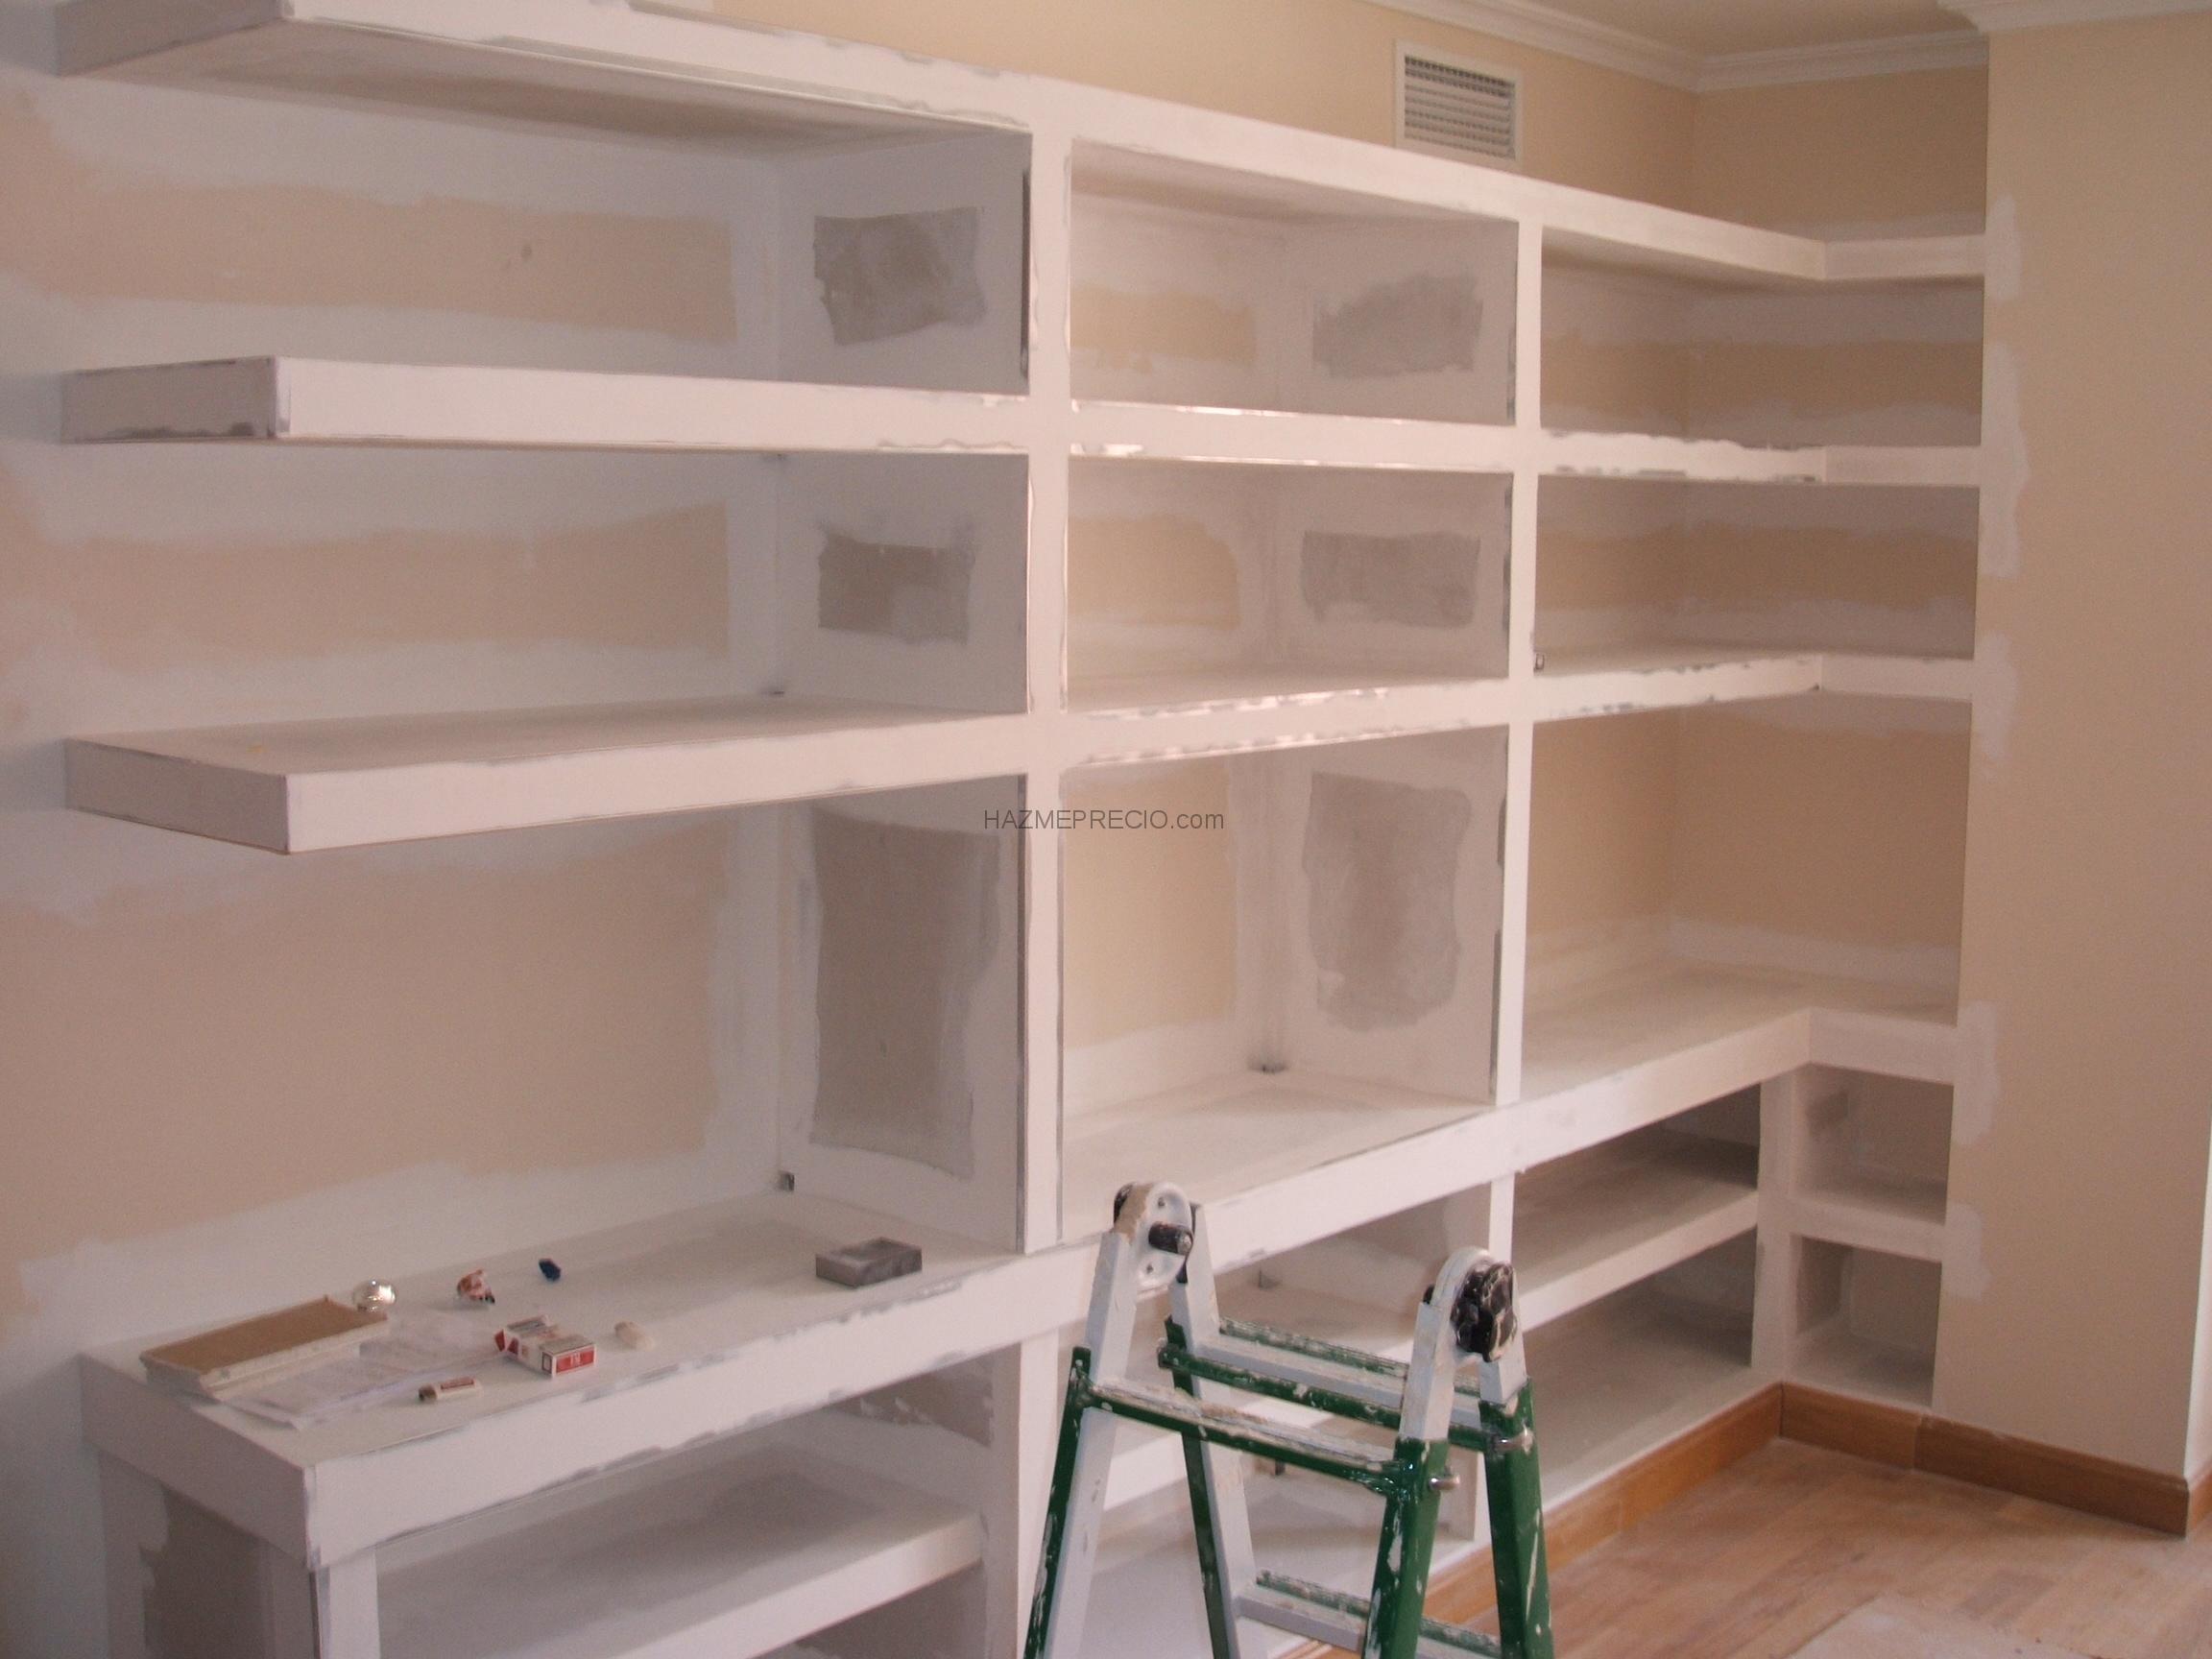 Mueble de escayola dise os arquitect nicos - Mueble de escayola ...